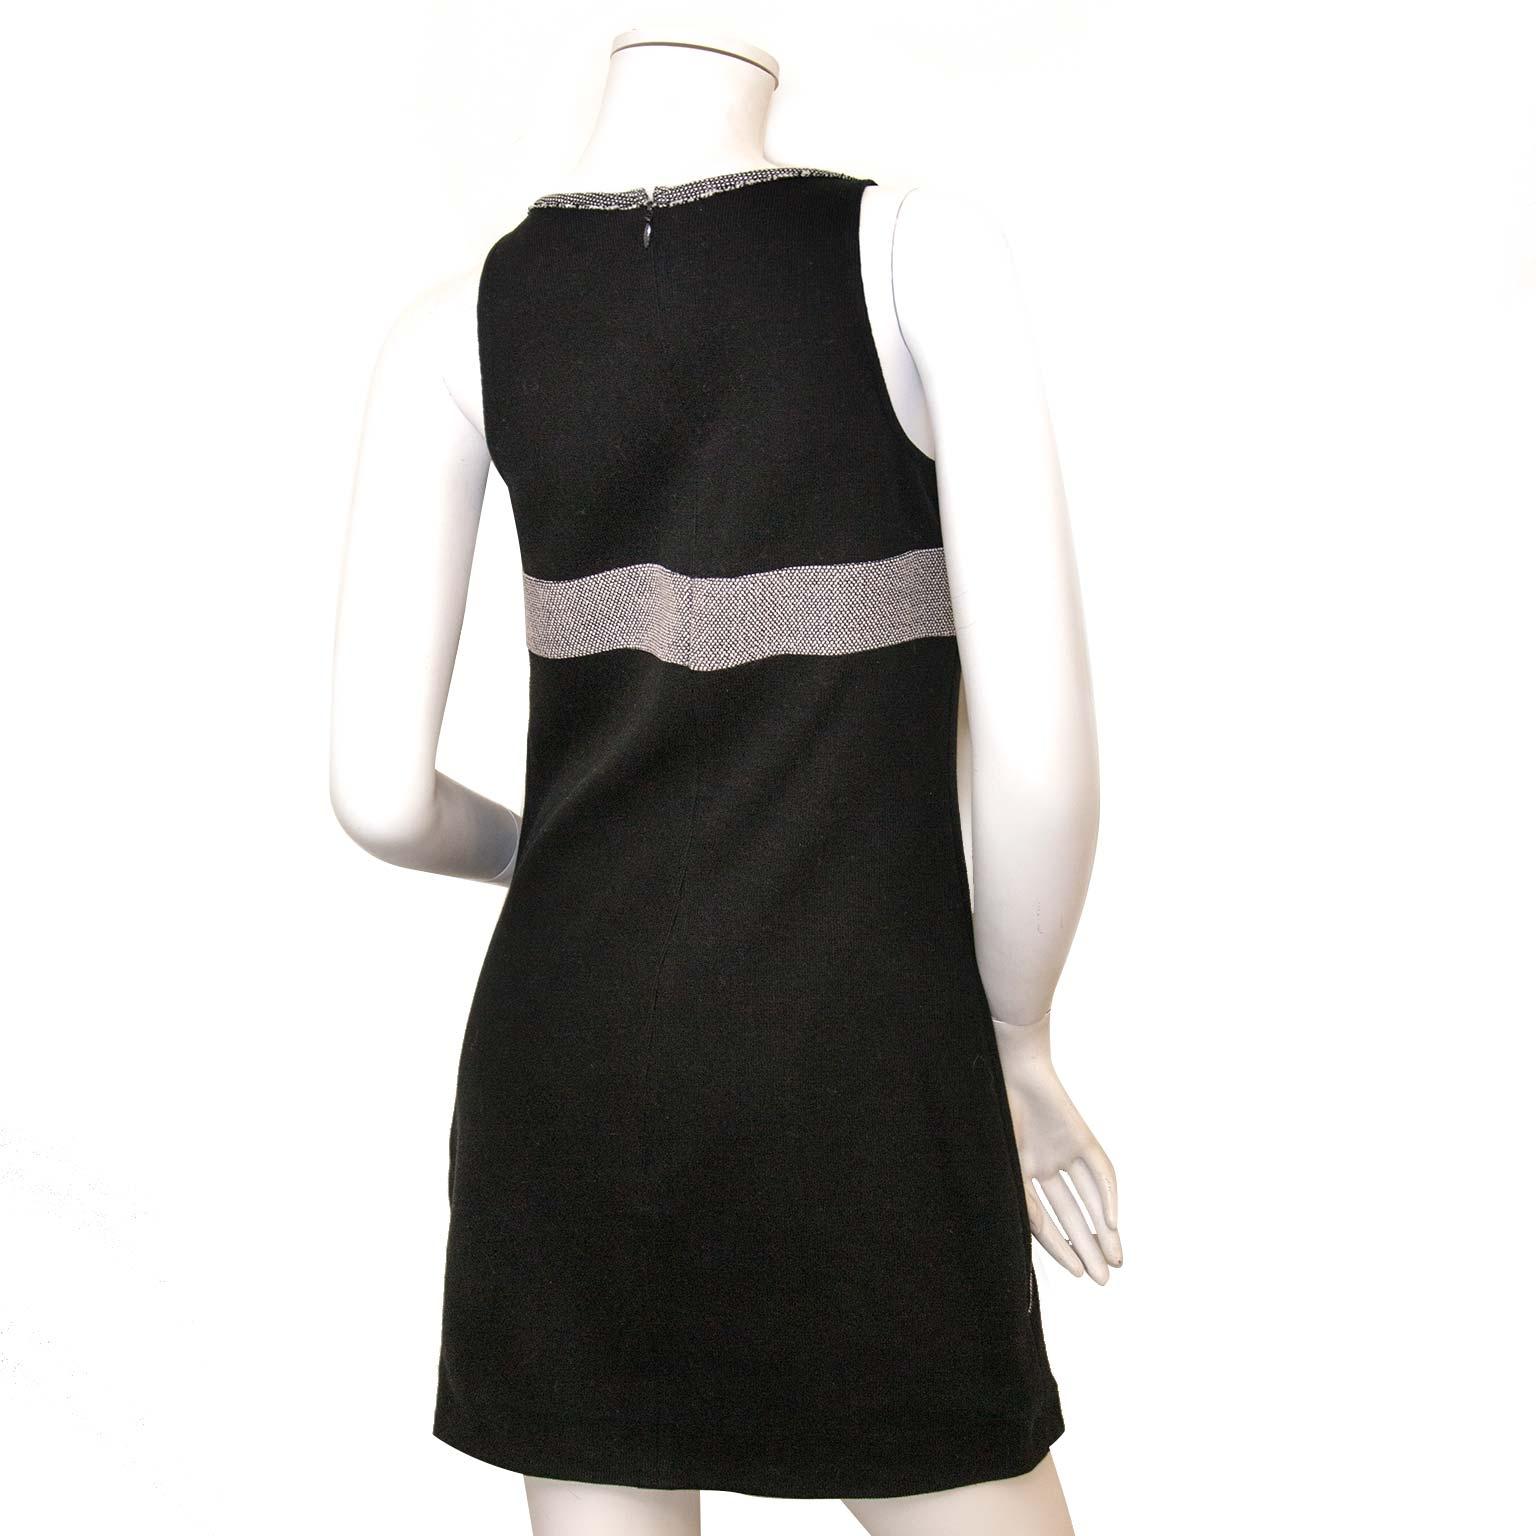 Koop authentieke Chanel kleding online bij Labellov vintage fashion webshop